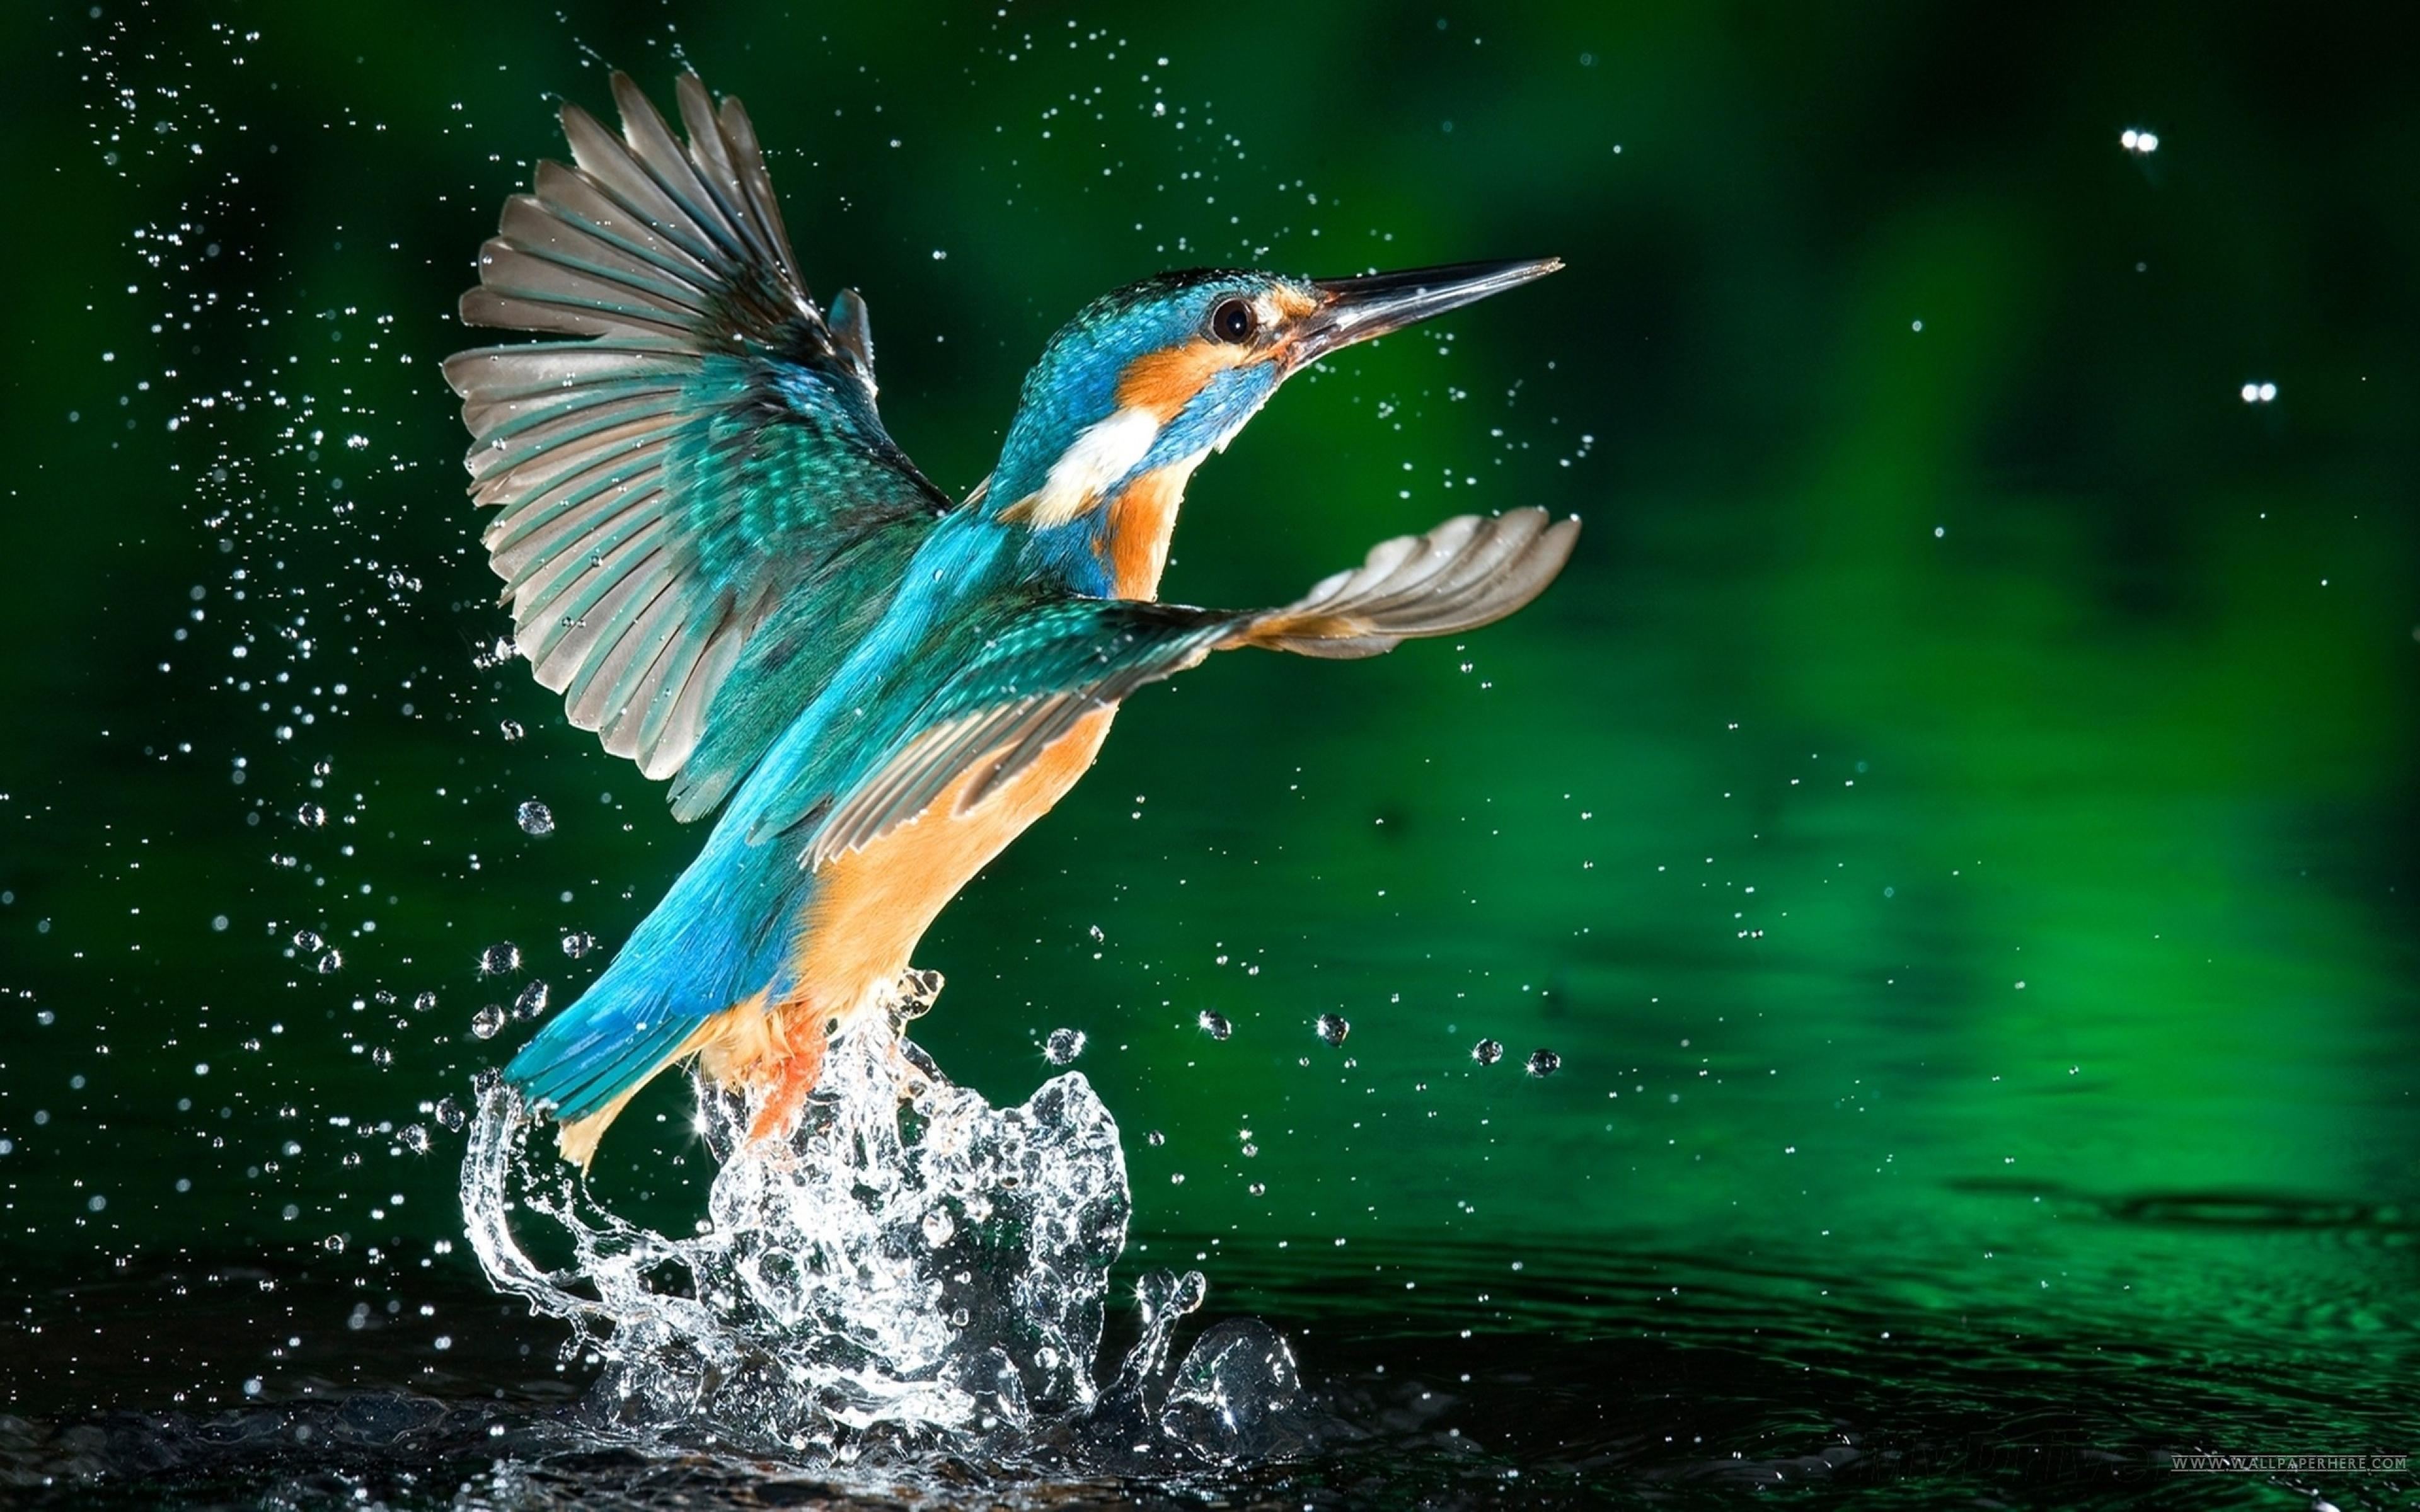 Download Original Resolution - Bird Flying From Water , HD Wallpaper & Backgrounds